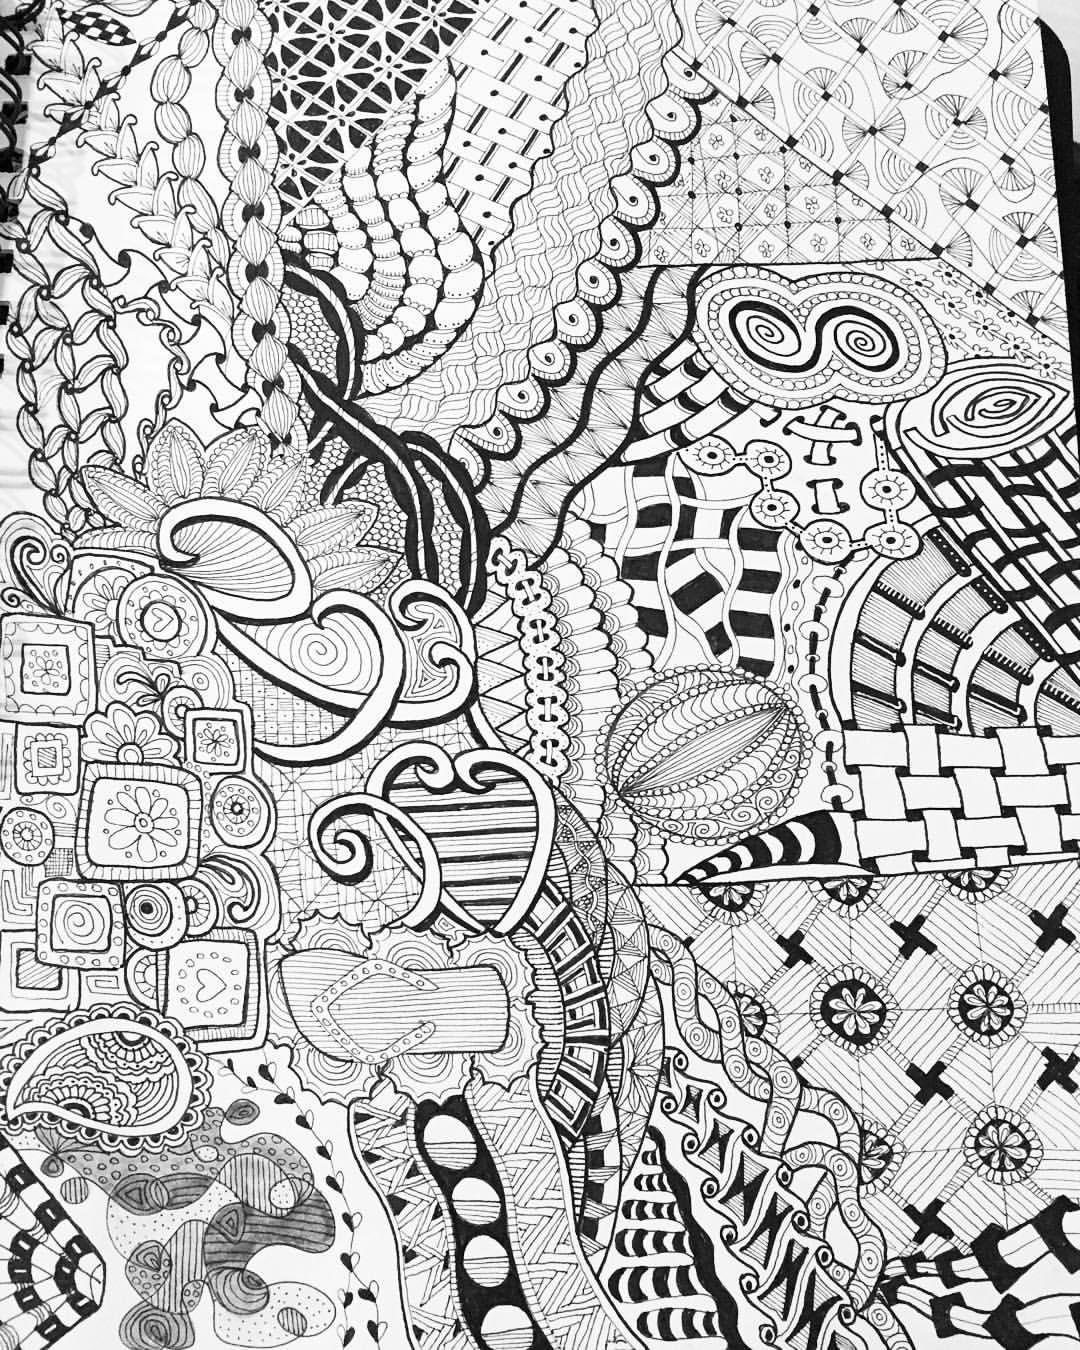 #practicepage #sketchbook #micron #blackandwhite #zendoodle